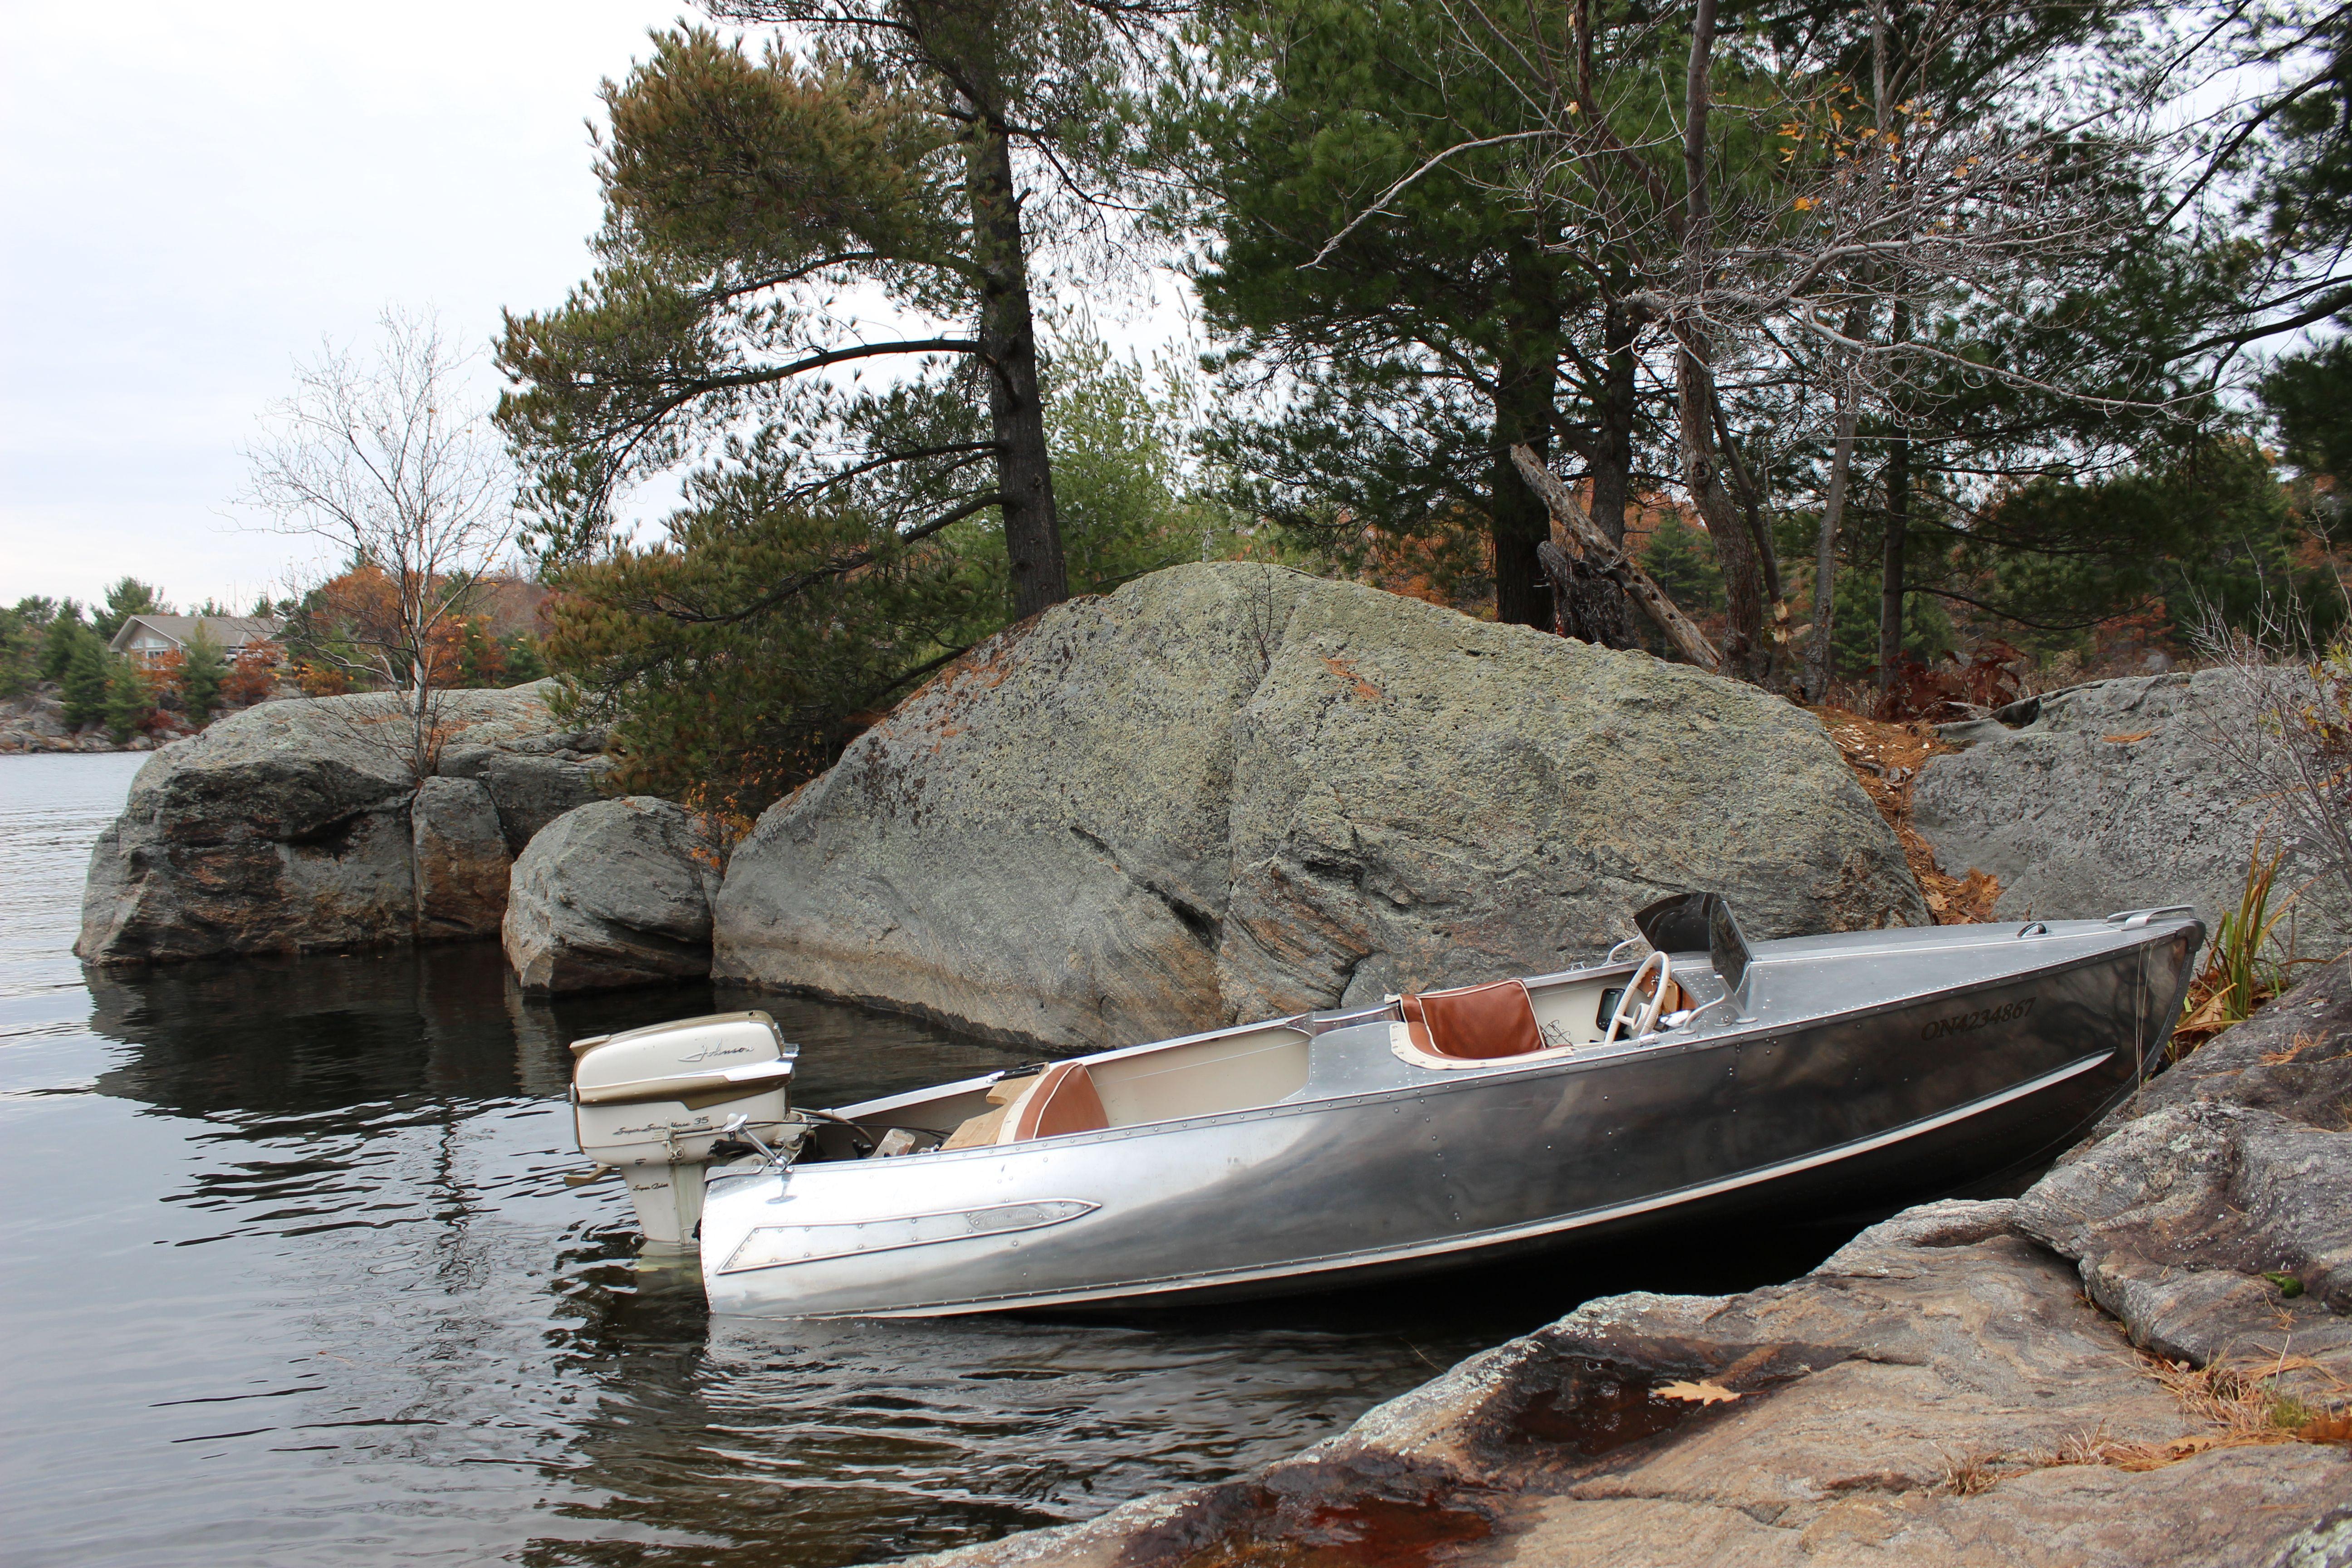 1958 Feathercraft Vagabond Boat in Mactier Ontario 2015 ...